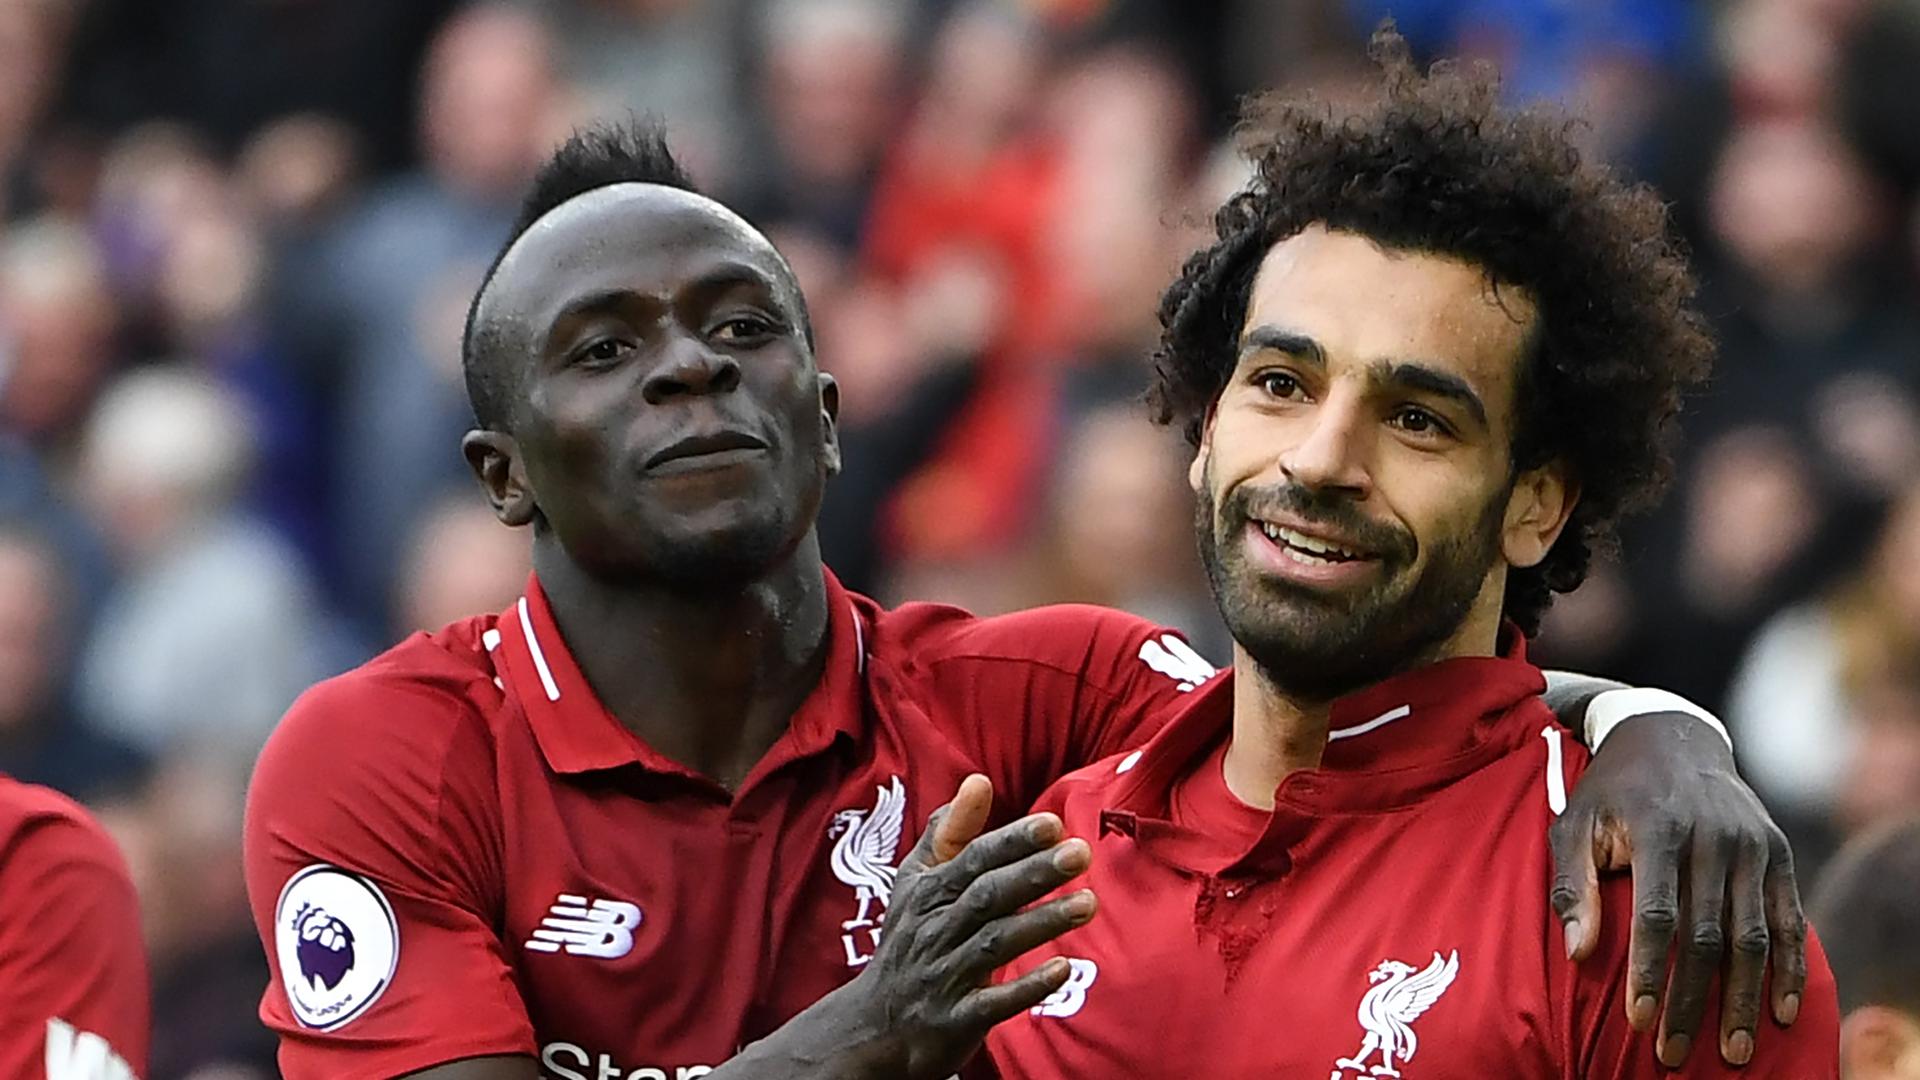 Mohamed Salah Sadio Mane Liverpool 2018